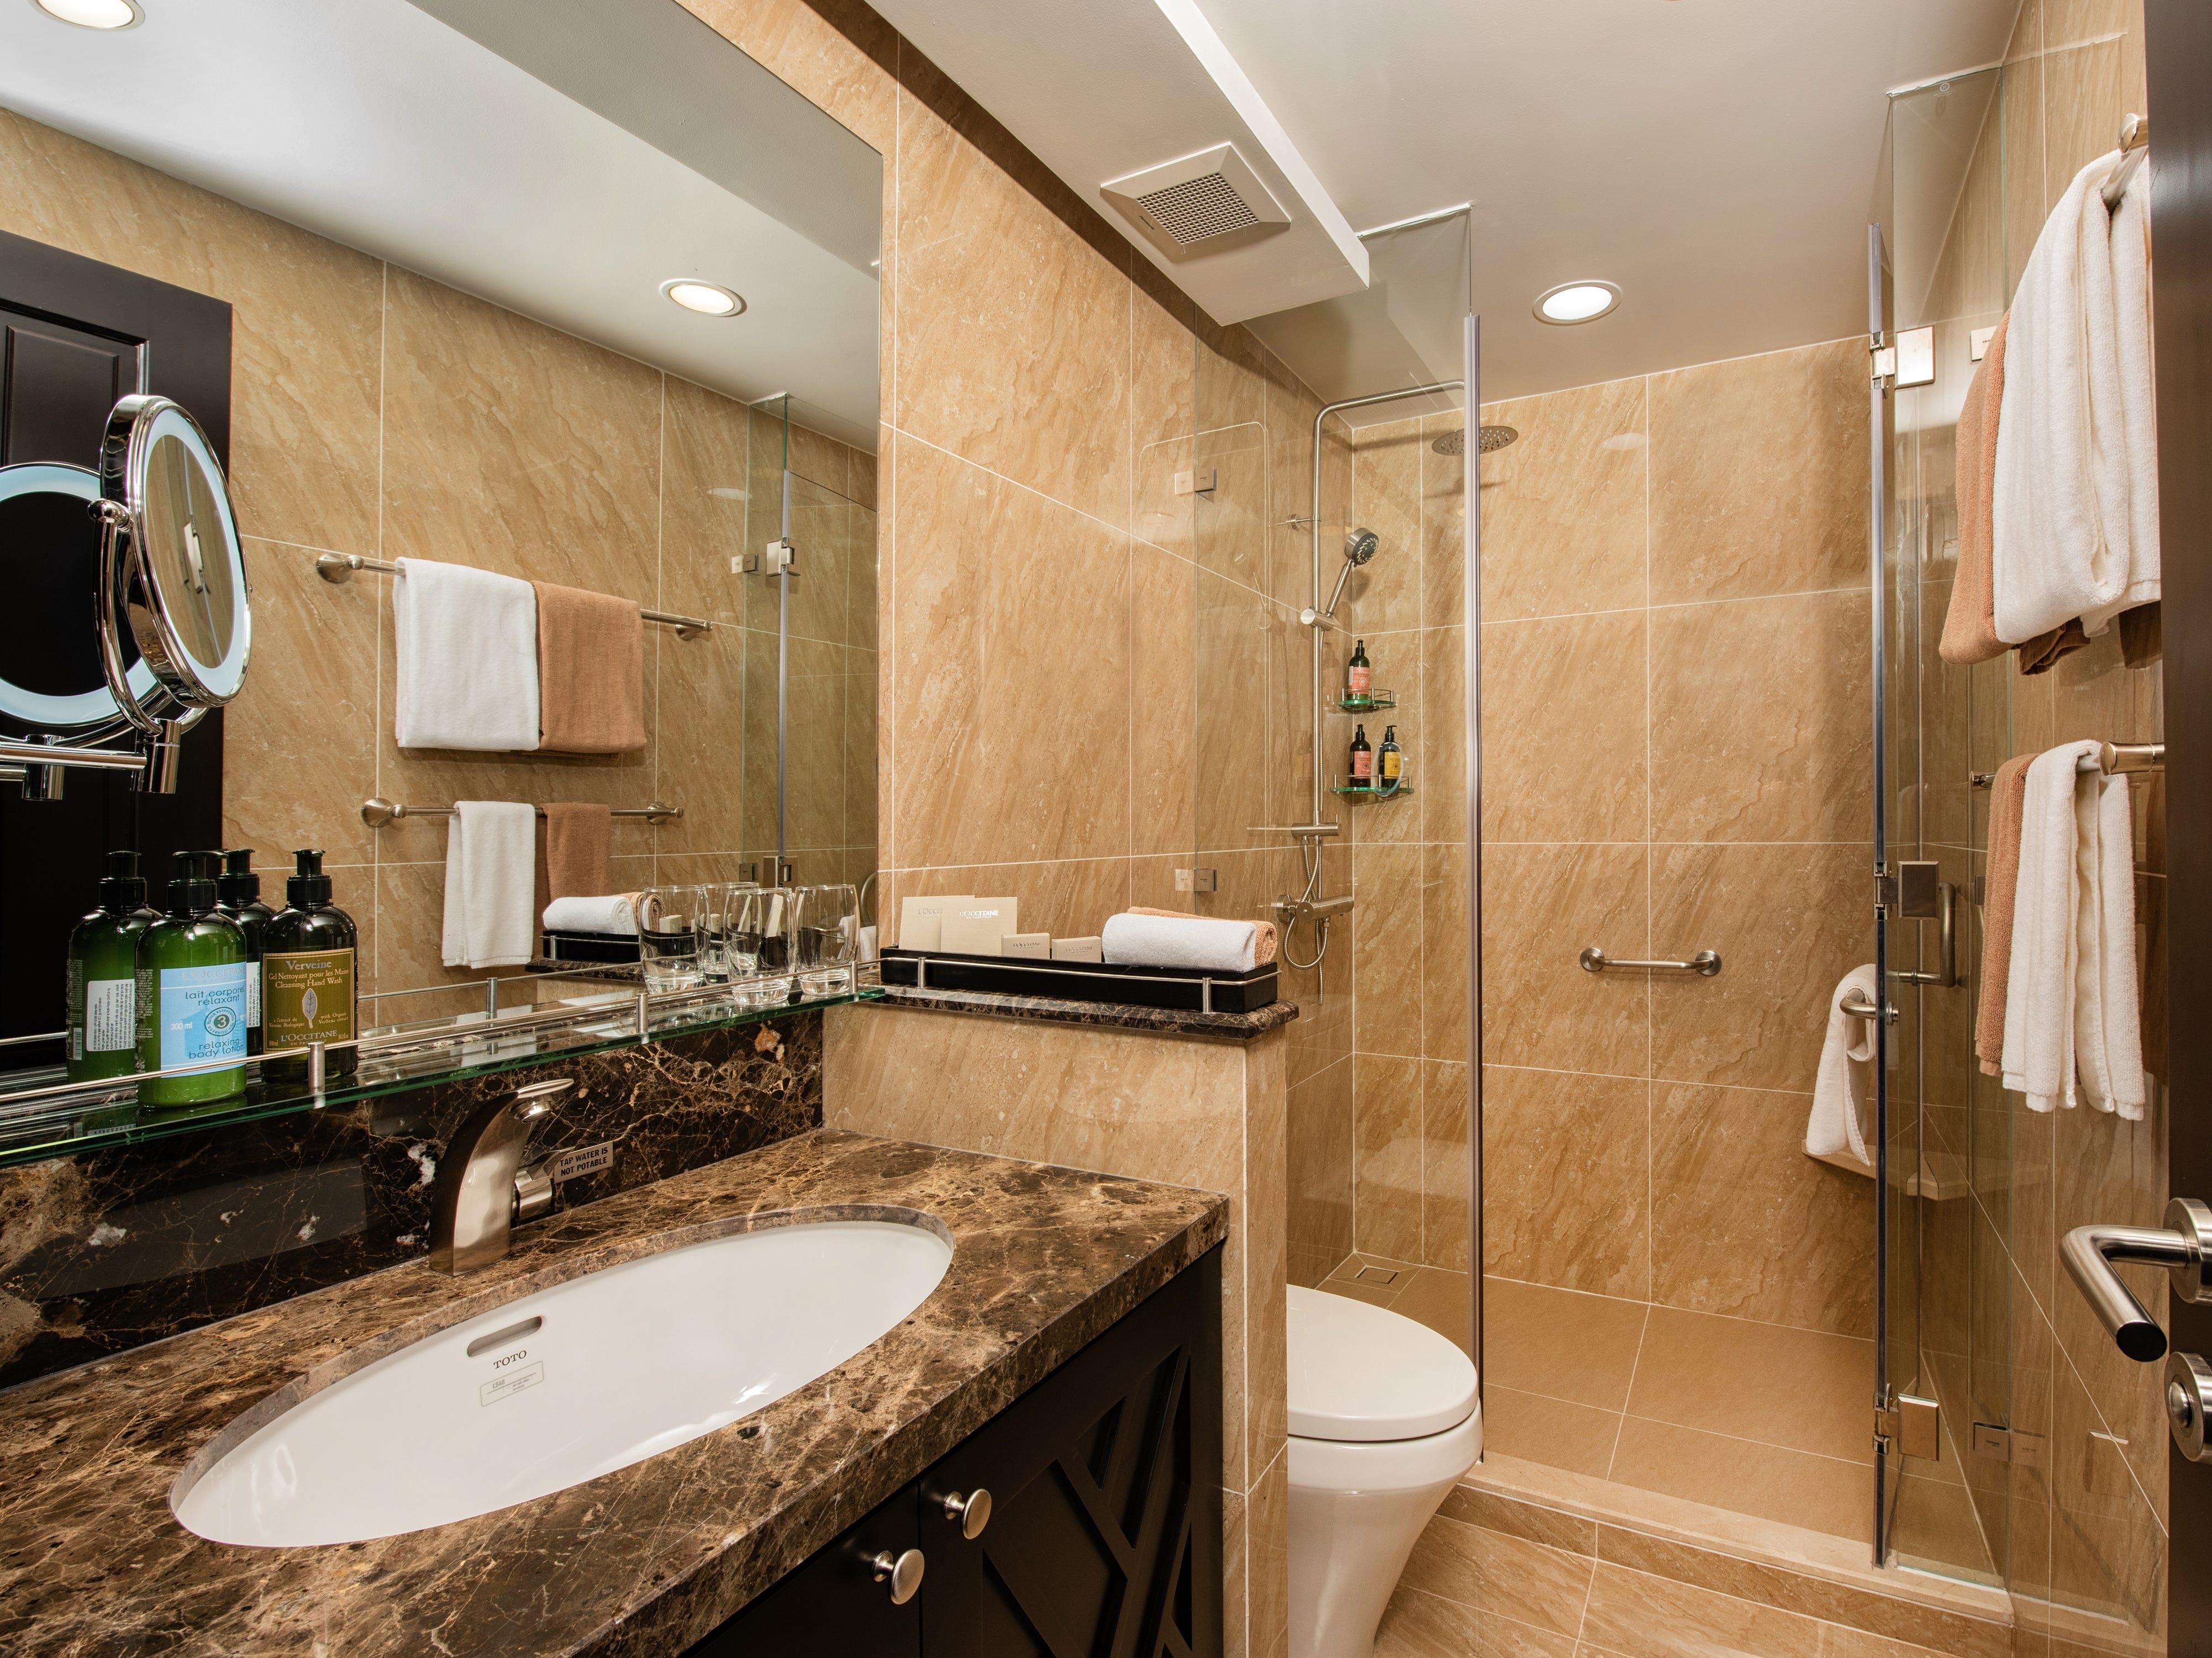 Avalon Saigon suites feature stylish, contemporary bathrooms.